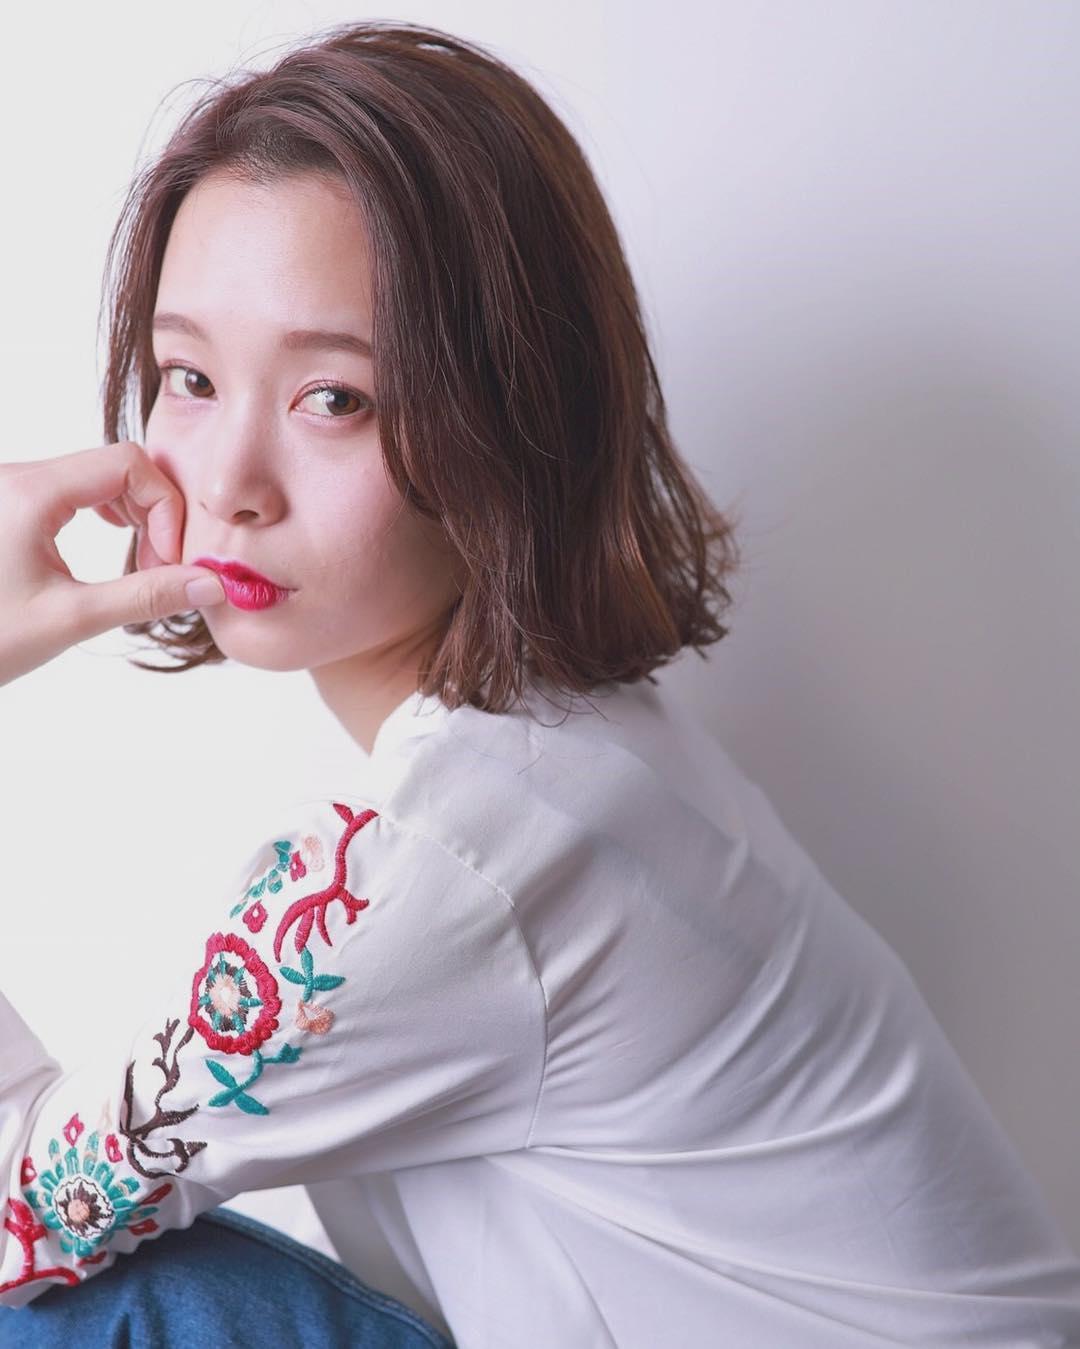 井野美和子の画像